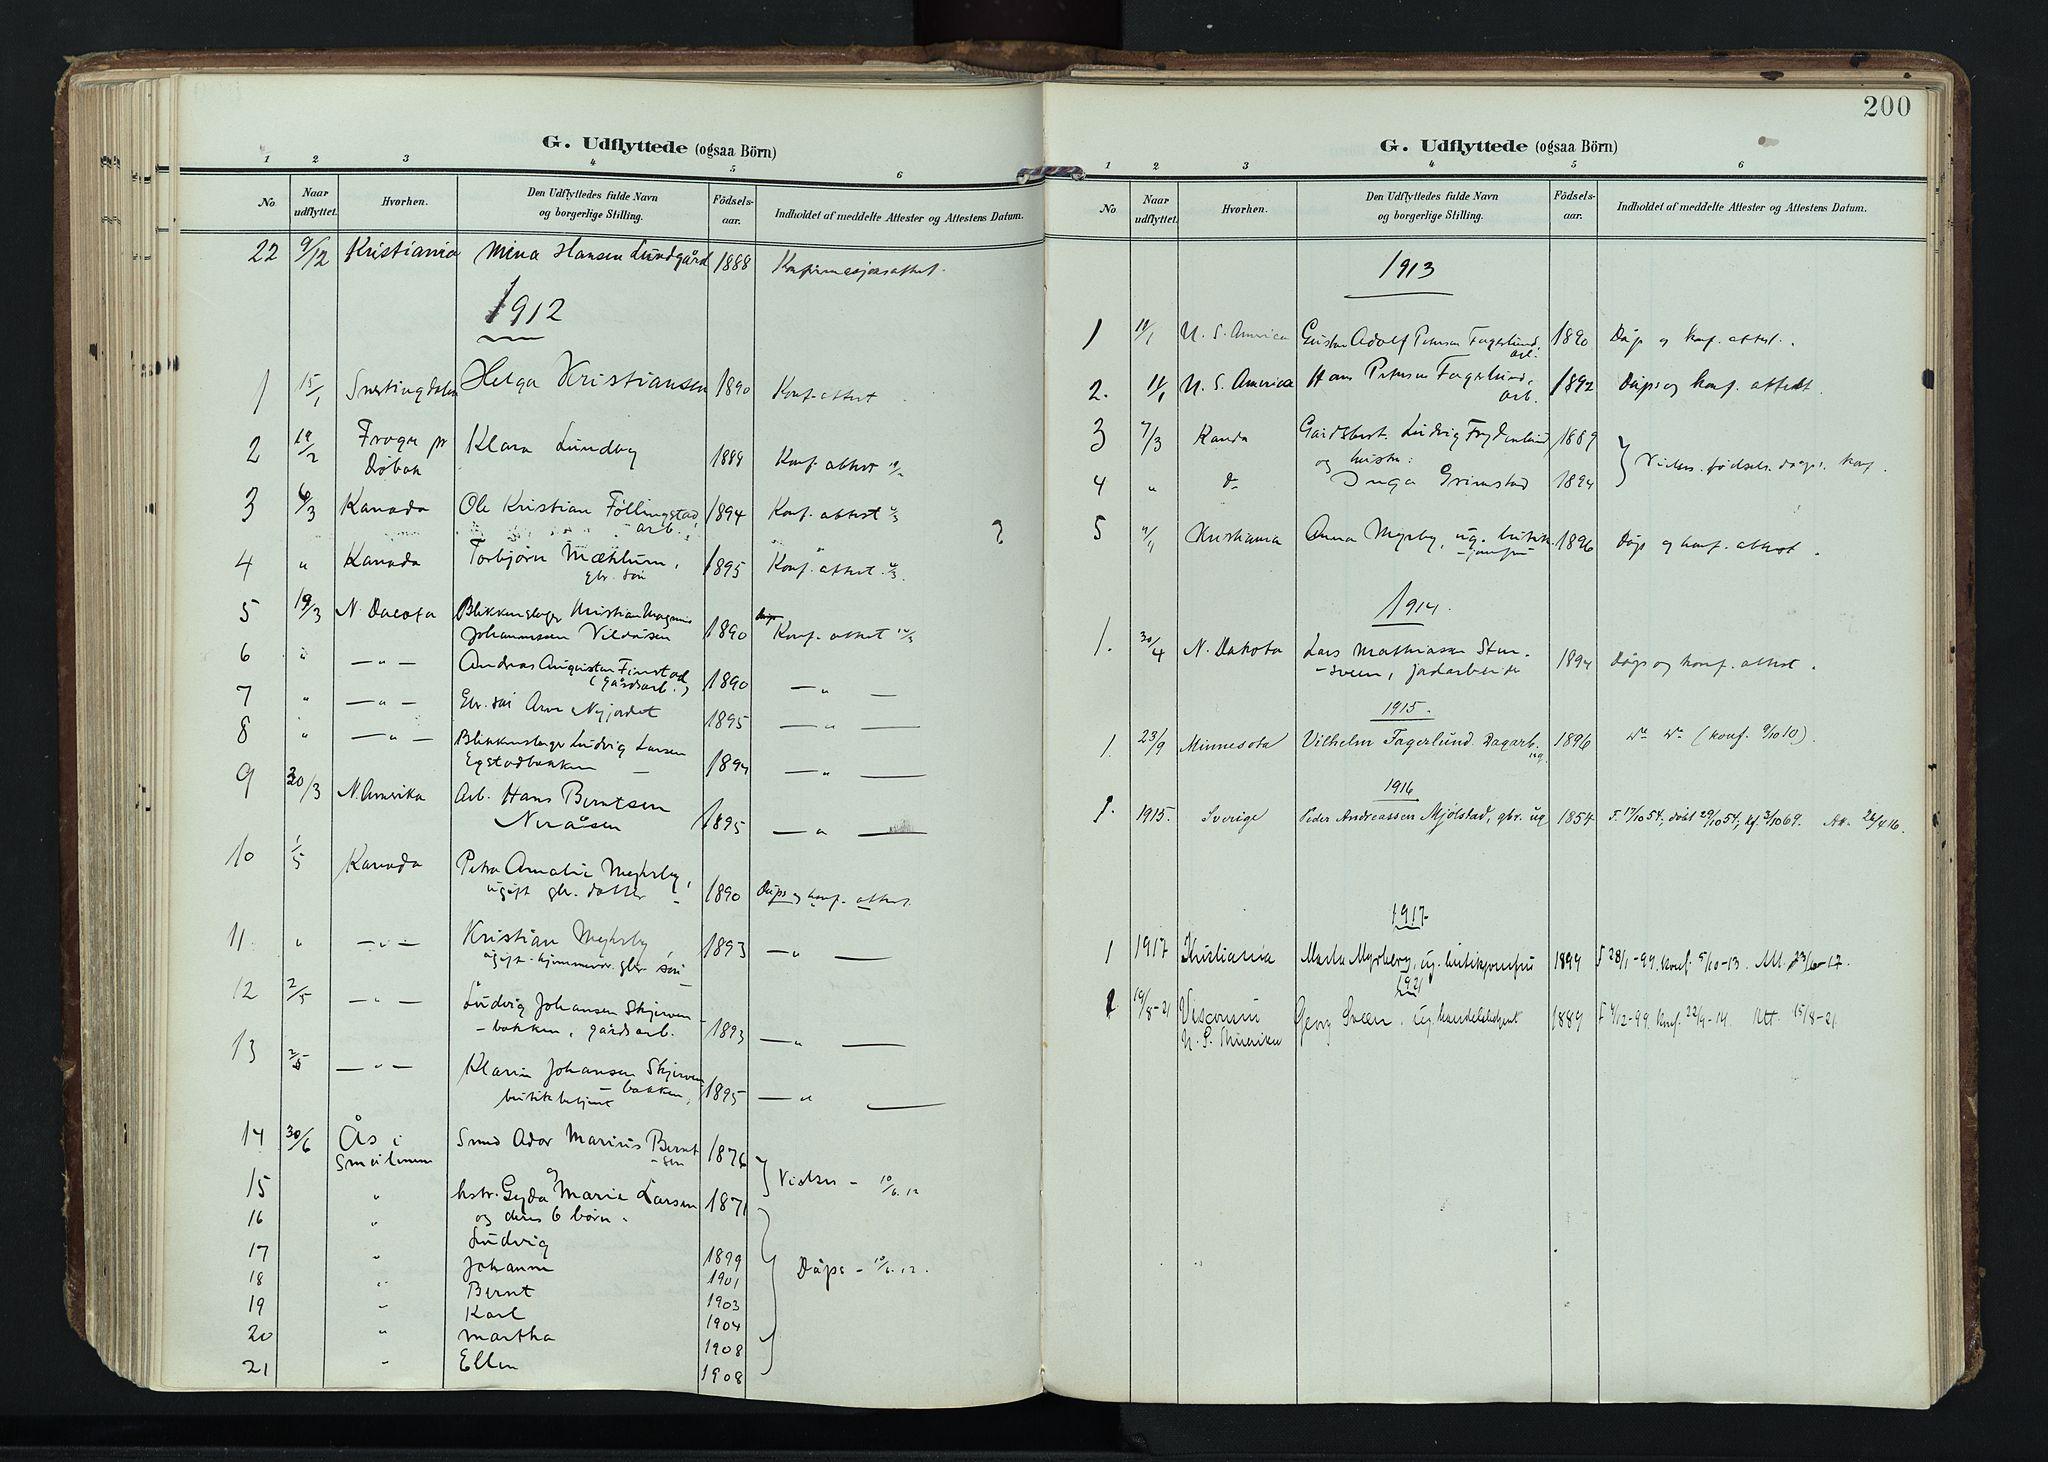 SAH, Vardal prestekontor, H/Ha/Haa/L0020: Ministerialbok nr. 20, 1907-1921, s. 200